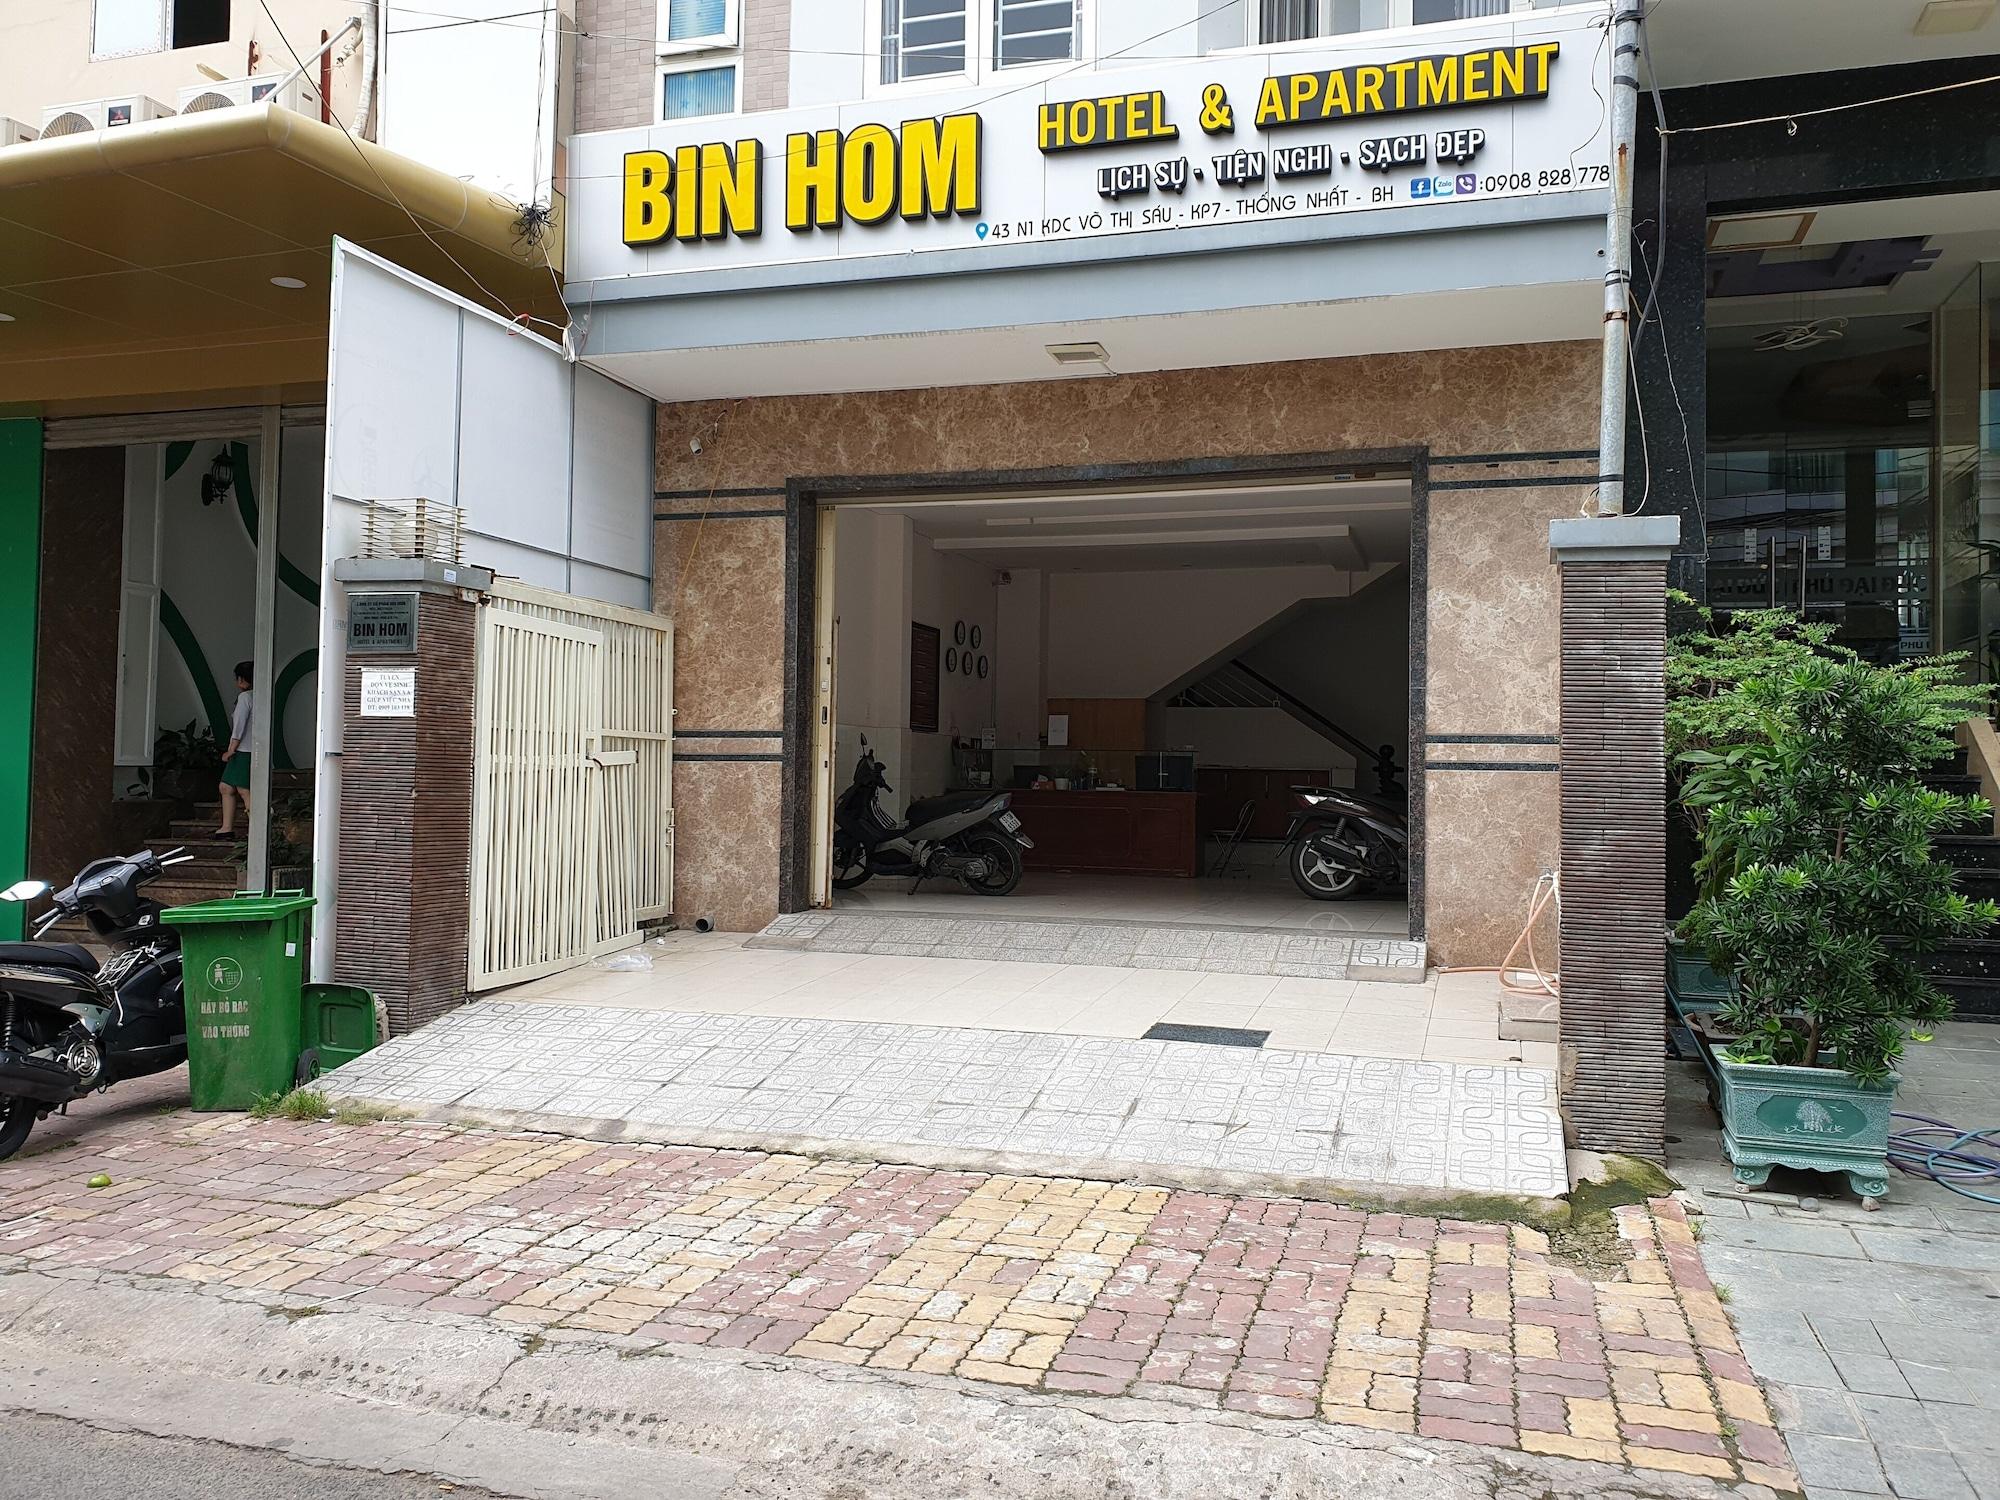 Bin Hom Hotel, Bien Hoa